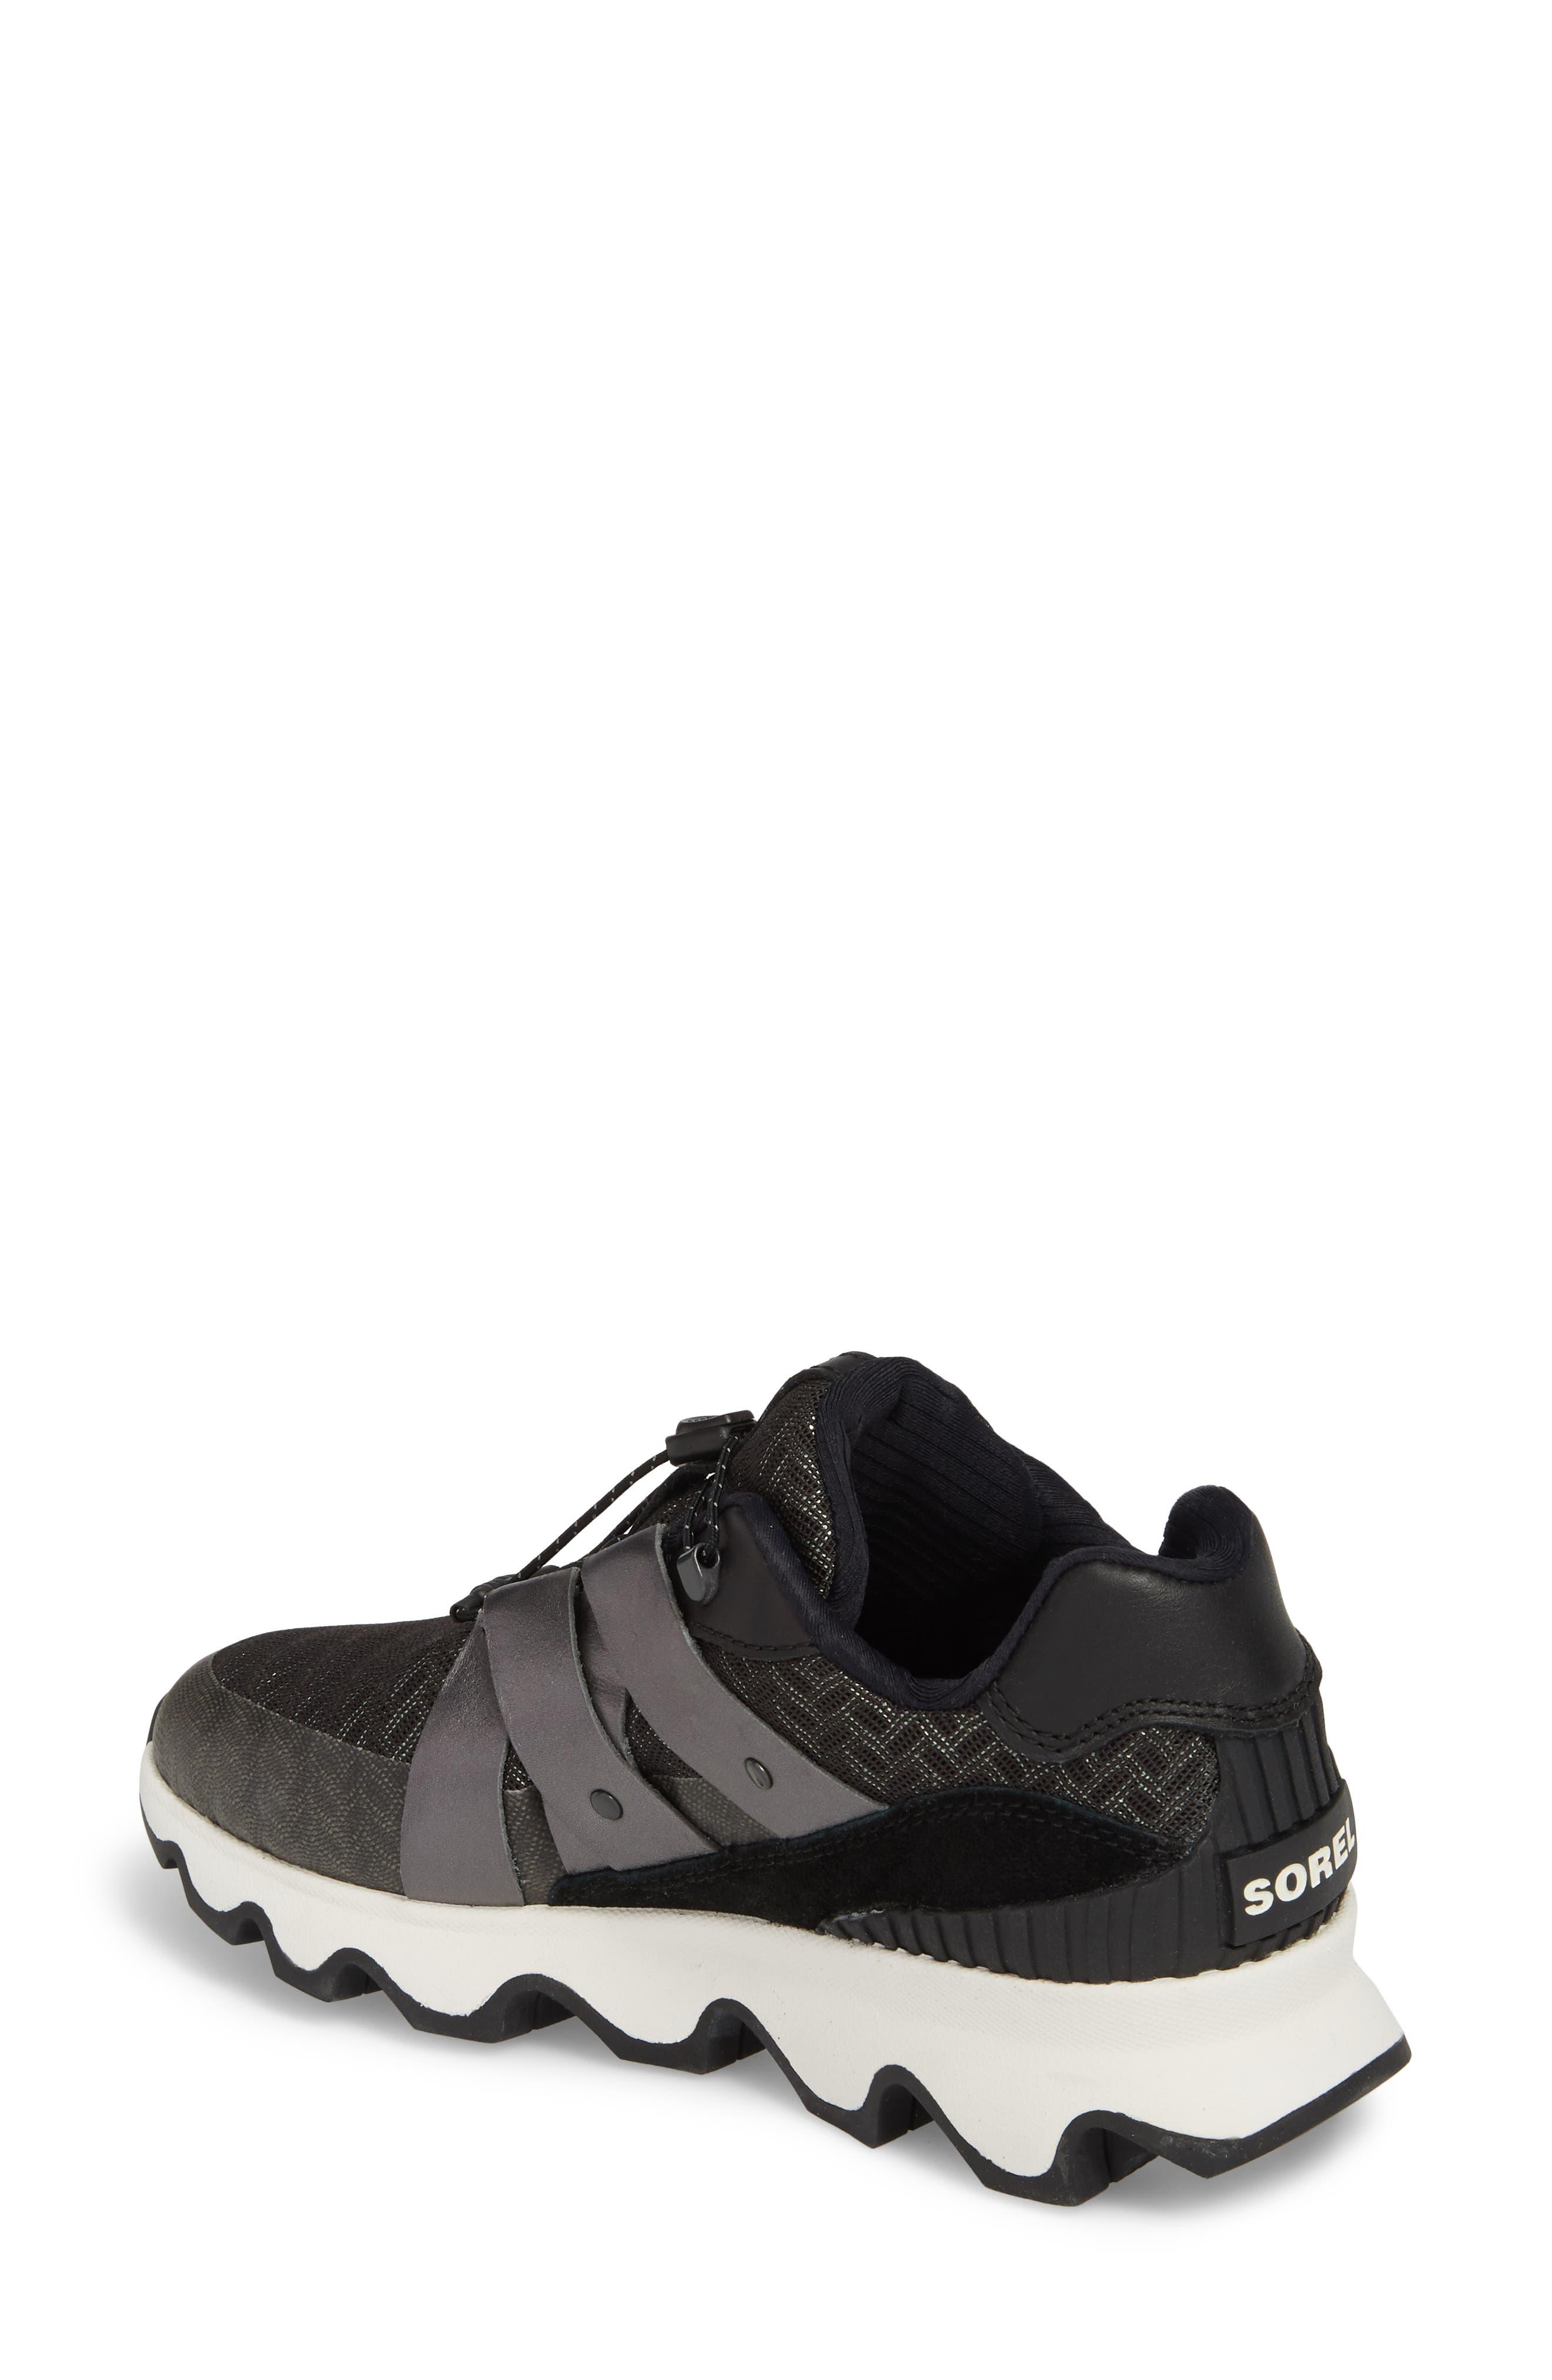 Kinetic Speed Sneaker,                             Alternate thumbnail 2, color,                             Black/ Sea Salt